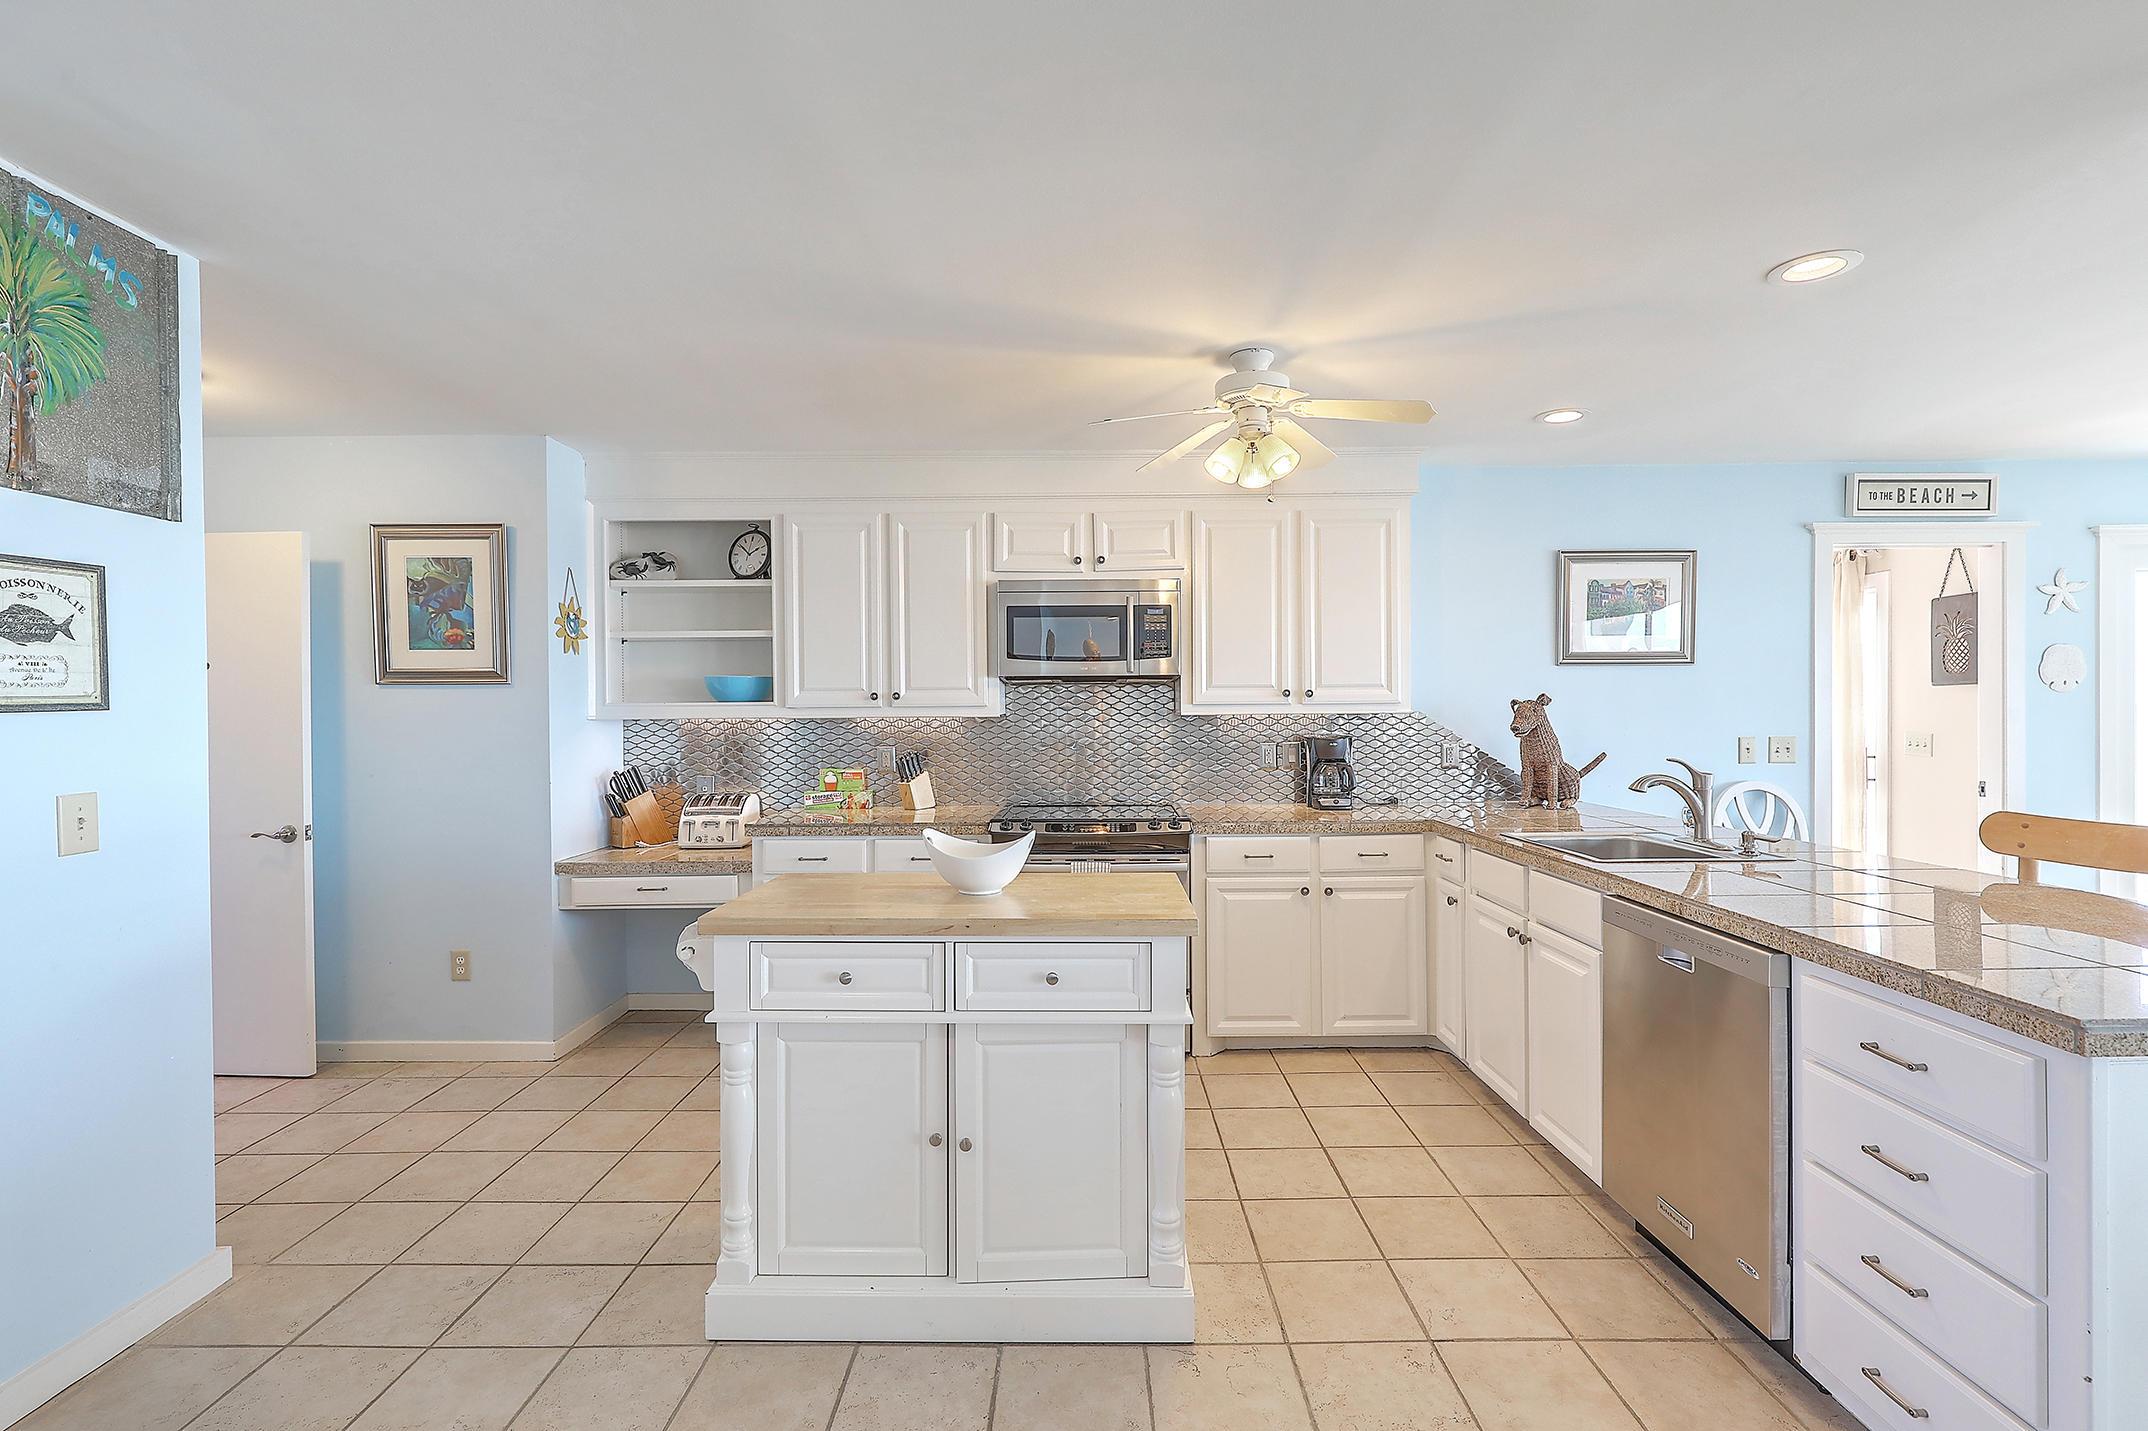 Wild Dunes Homes For Sale - 14 Beachwood East, Isle of Palms, SC - 8